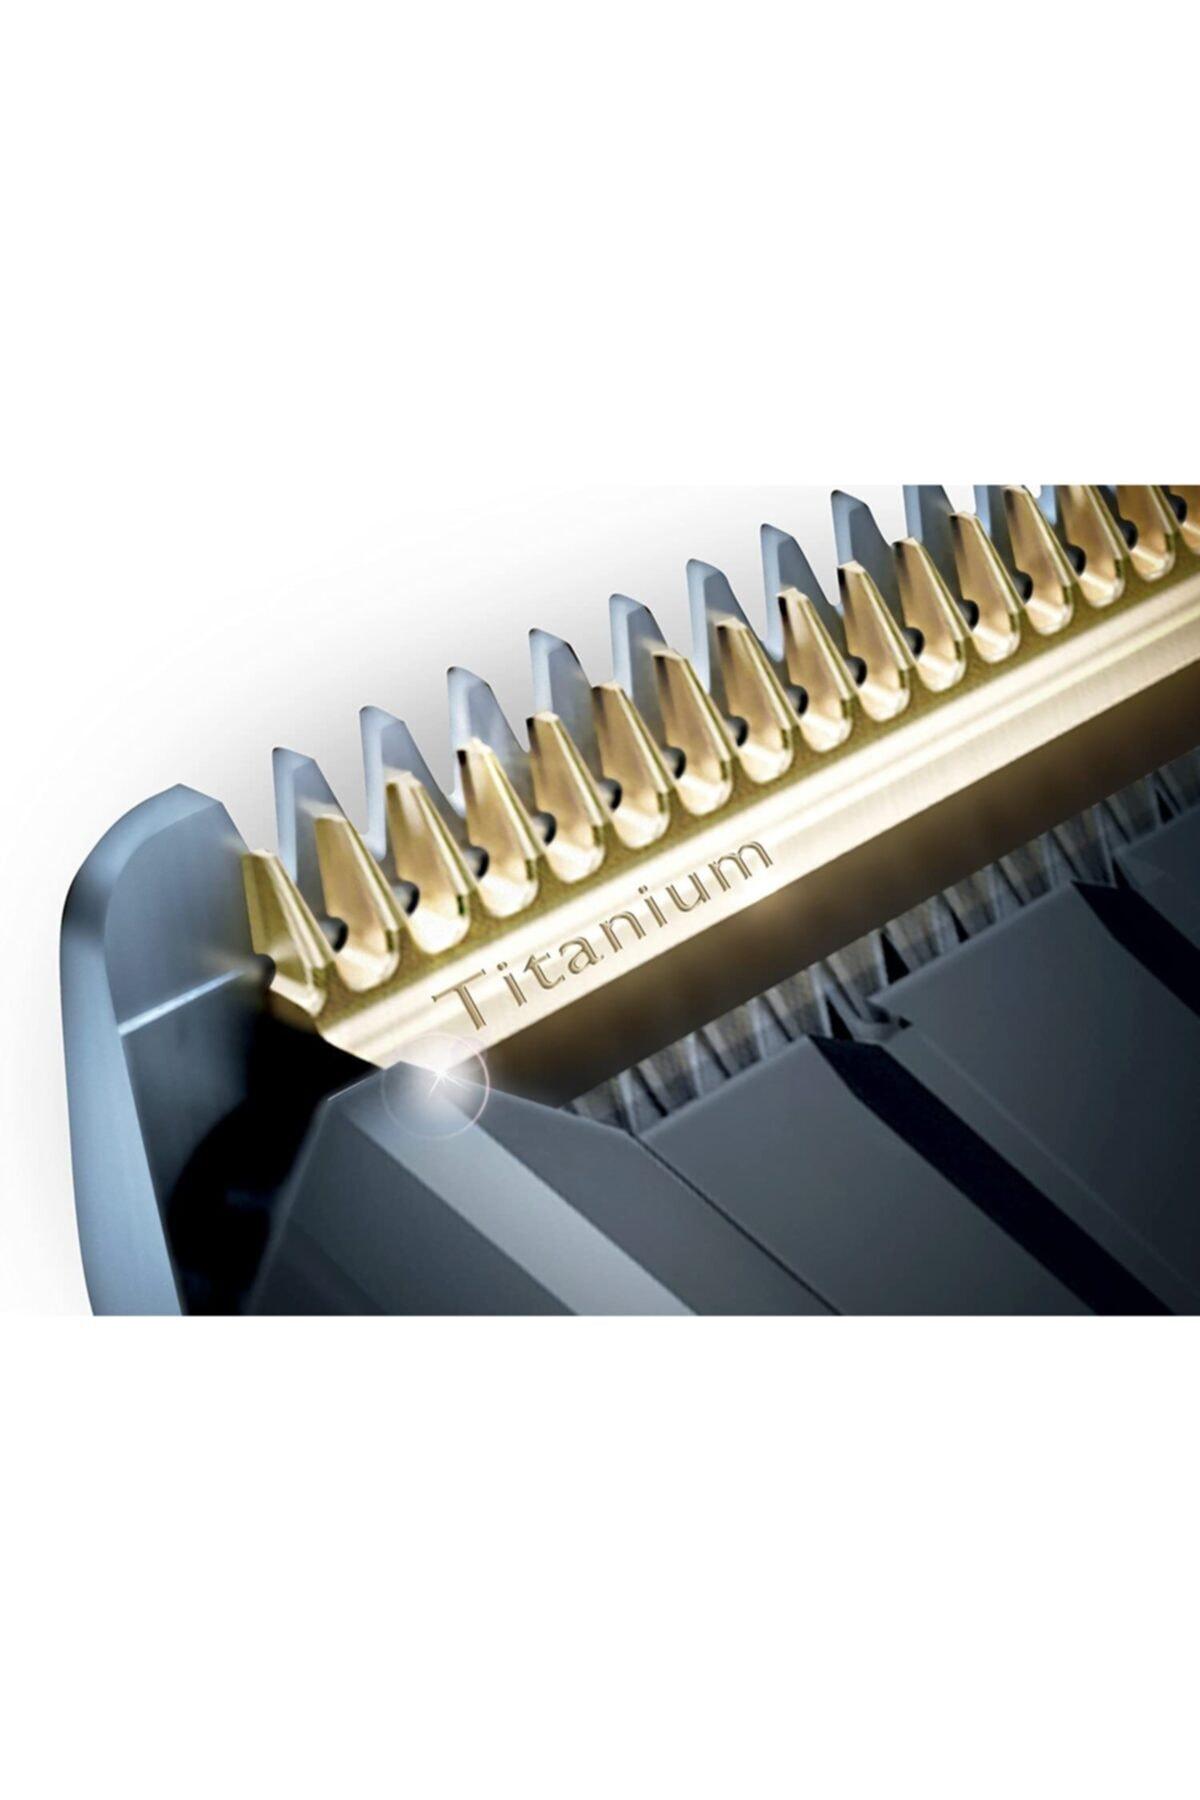 Philips Siyah Profesyonel Saç Kesme Makinesi 9000 Serisi Hc9450